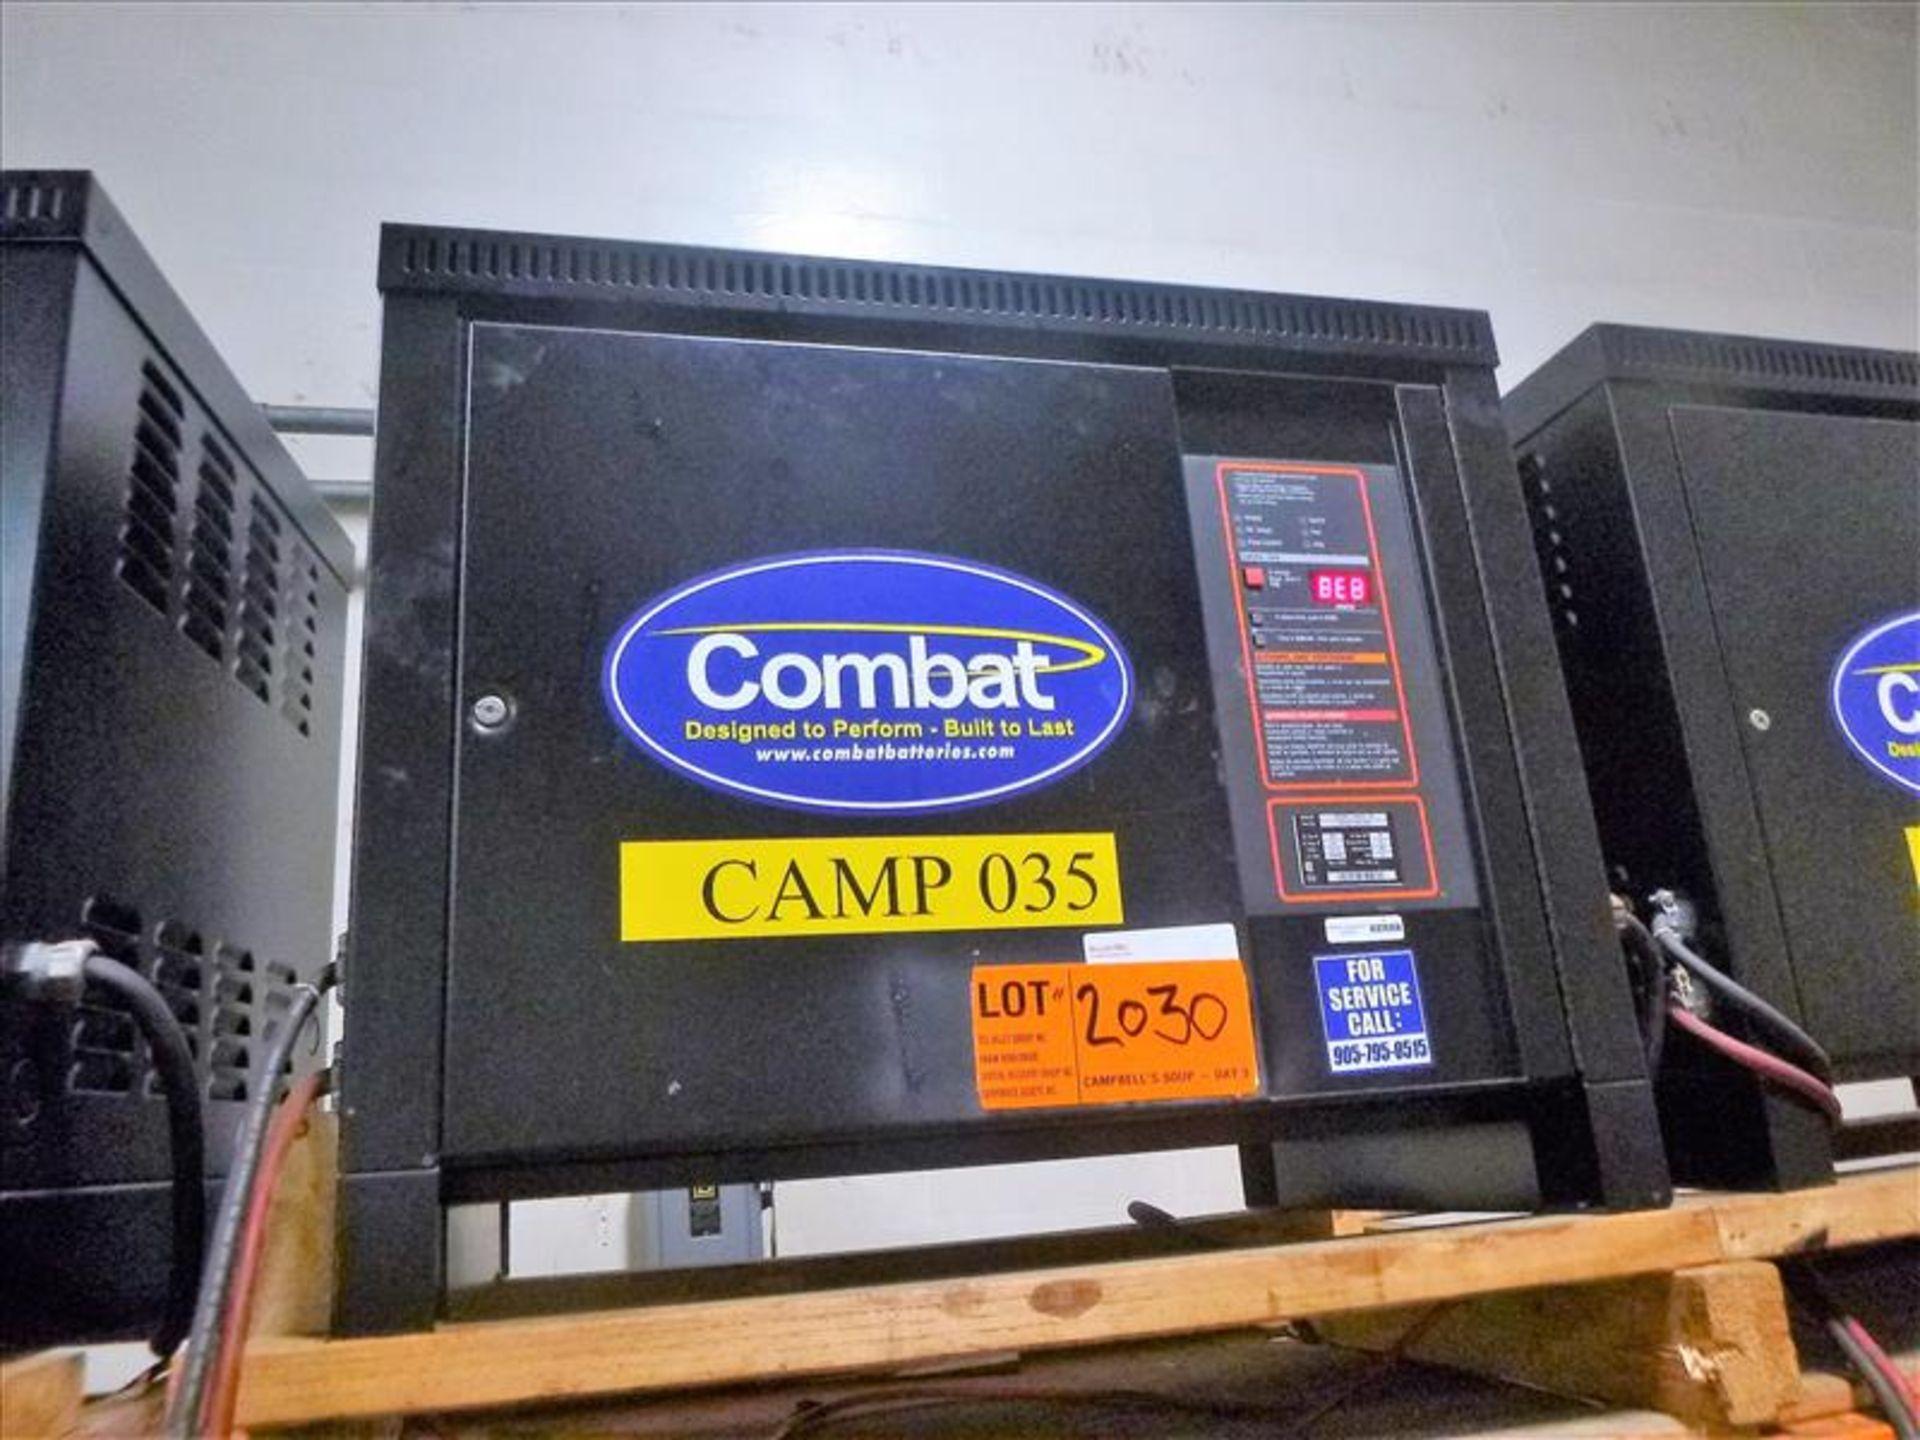 Lot 2030 - Combat battery charger, 48V [Material Handling]